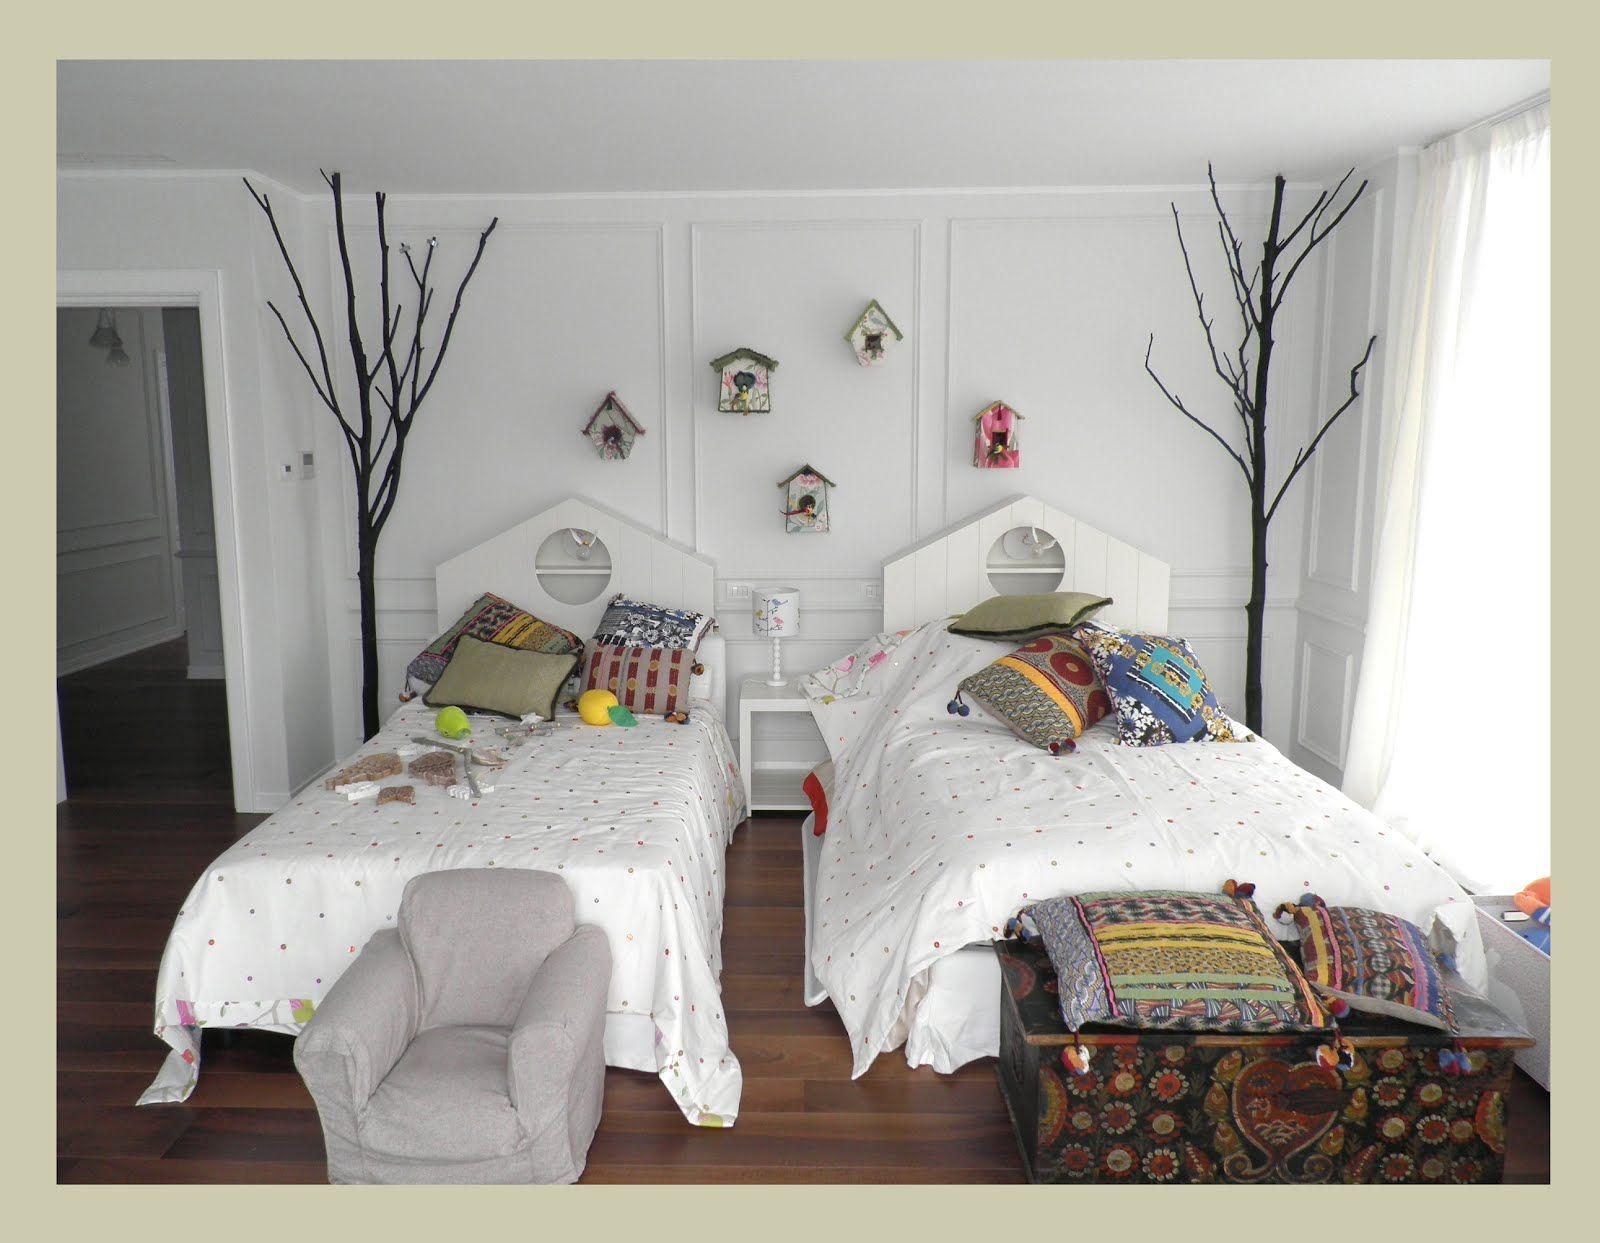 barato, fácil, original,   Bed headboards, Kids rooms and Bedrooms